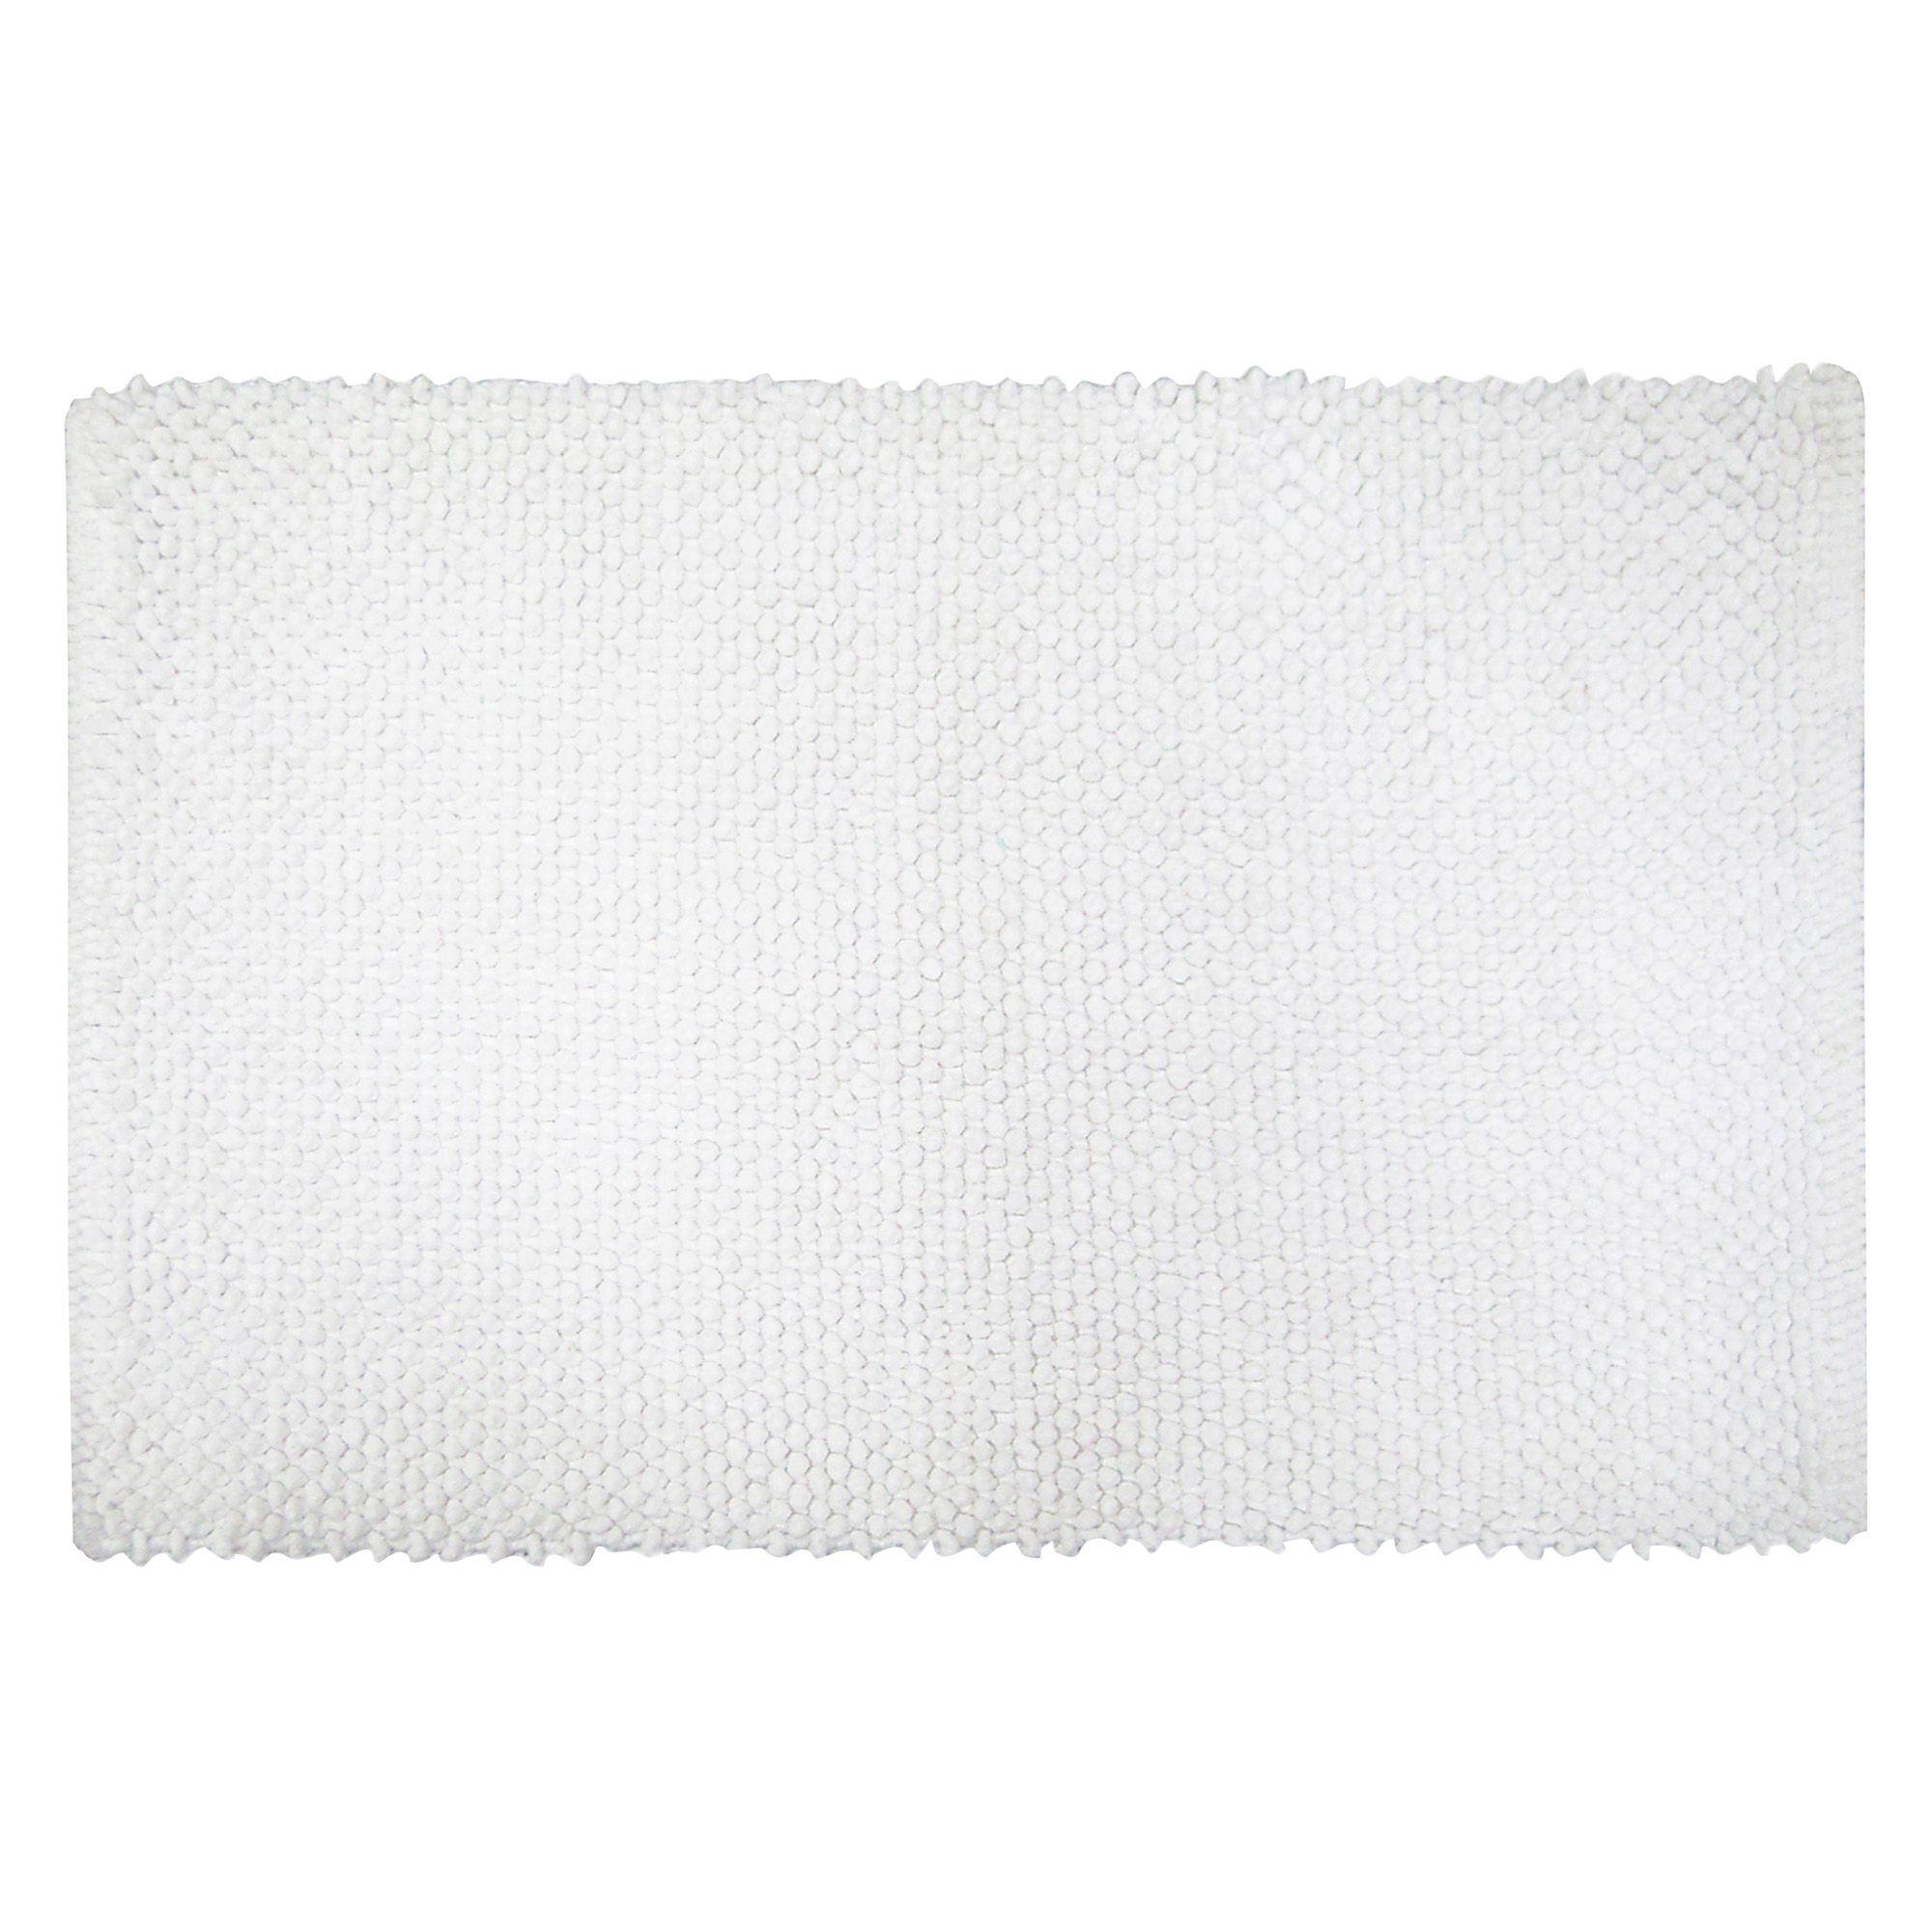 Cooke & Lewis Olson White Popcorn Cotton Bath Mat (l)80cm (w)500mm